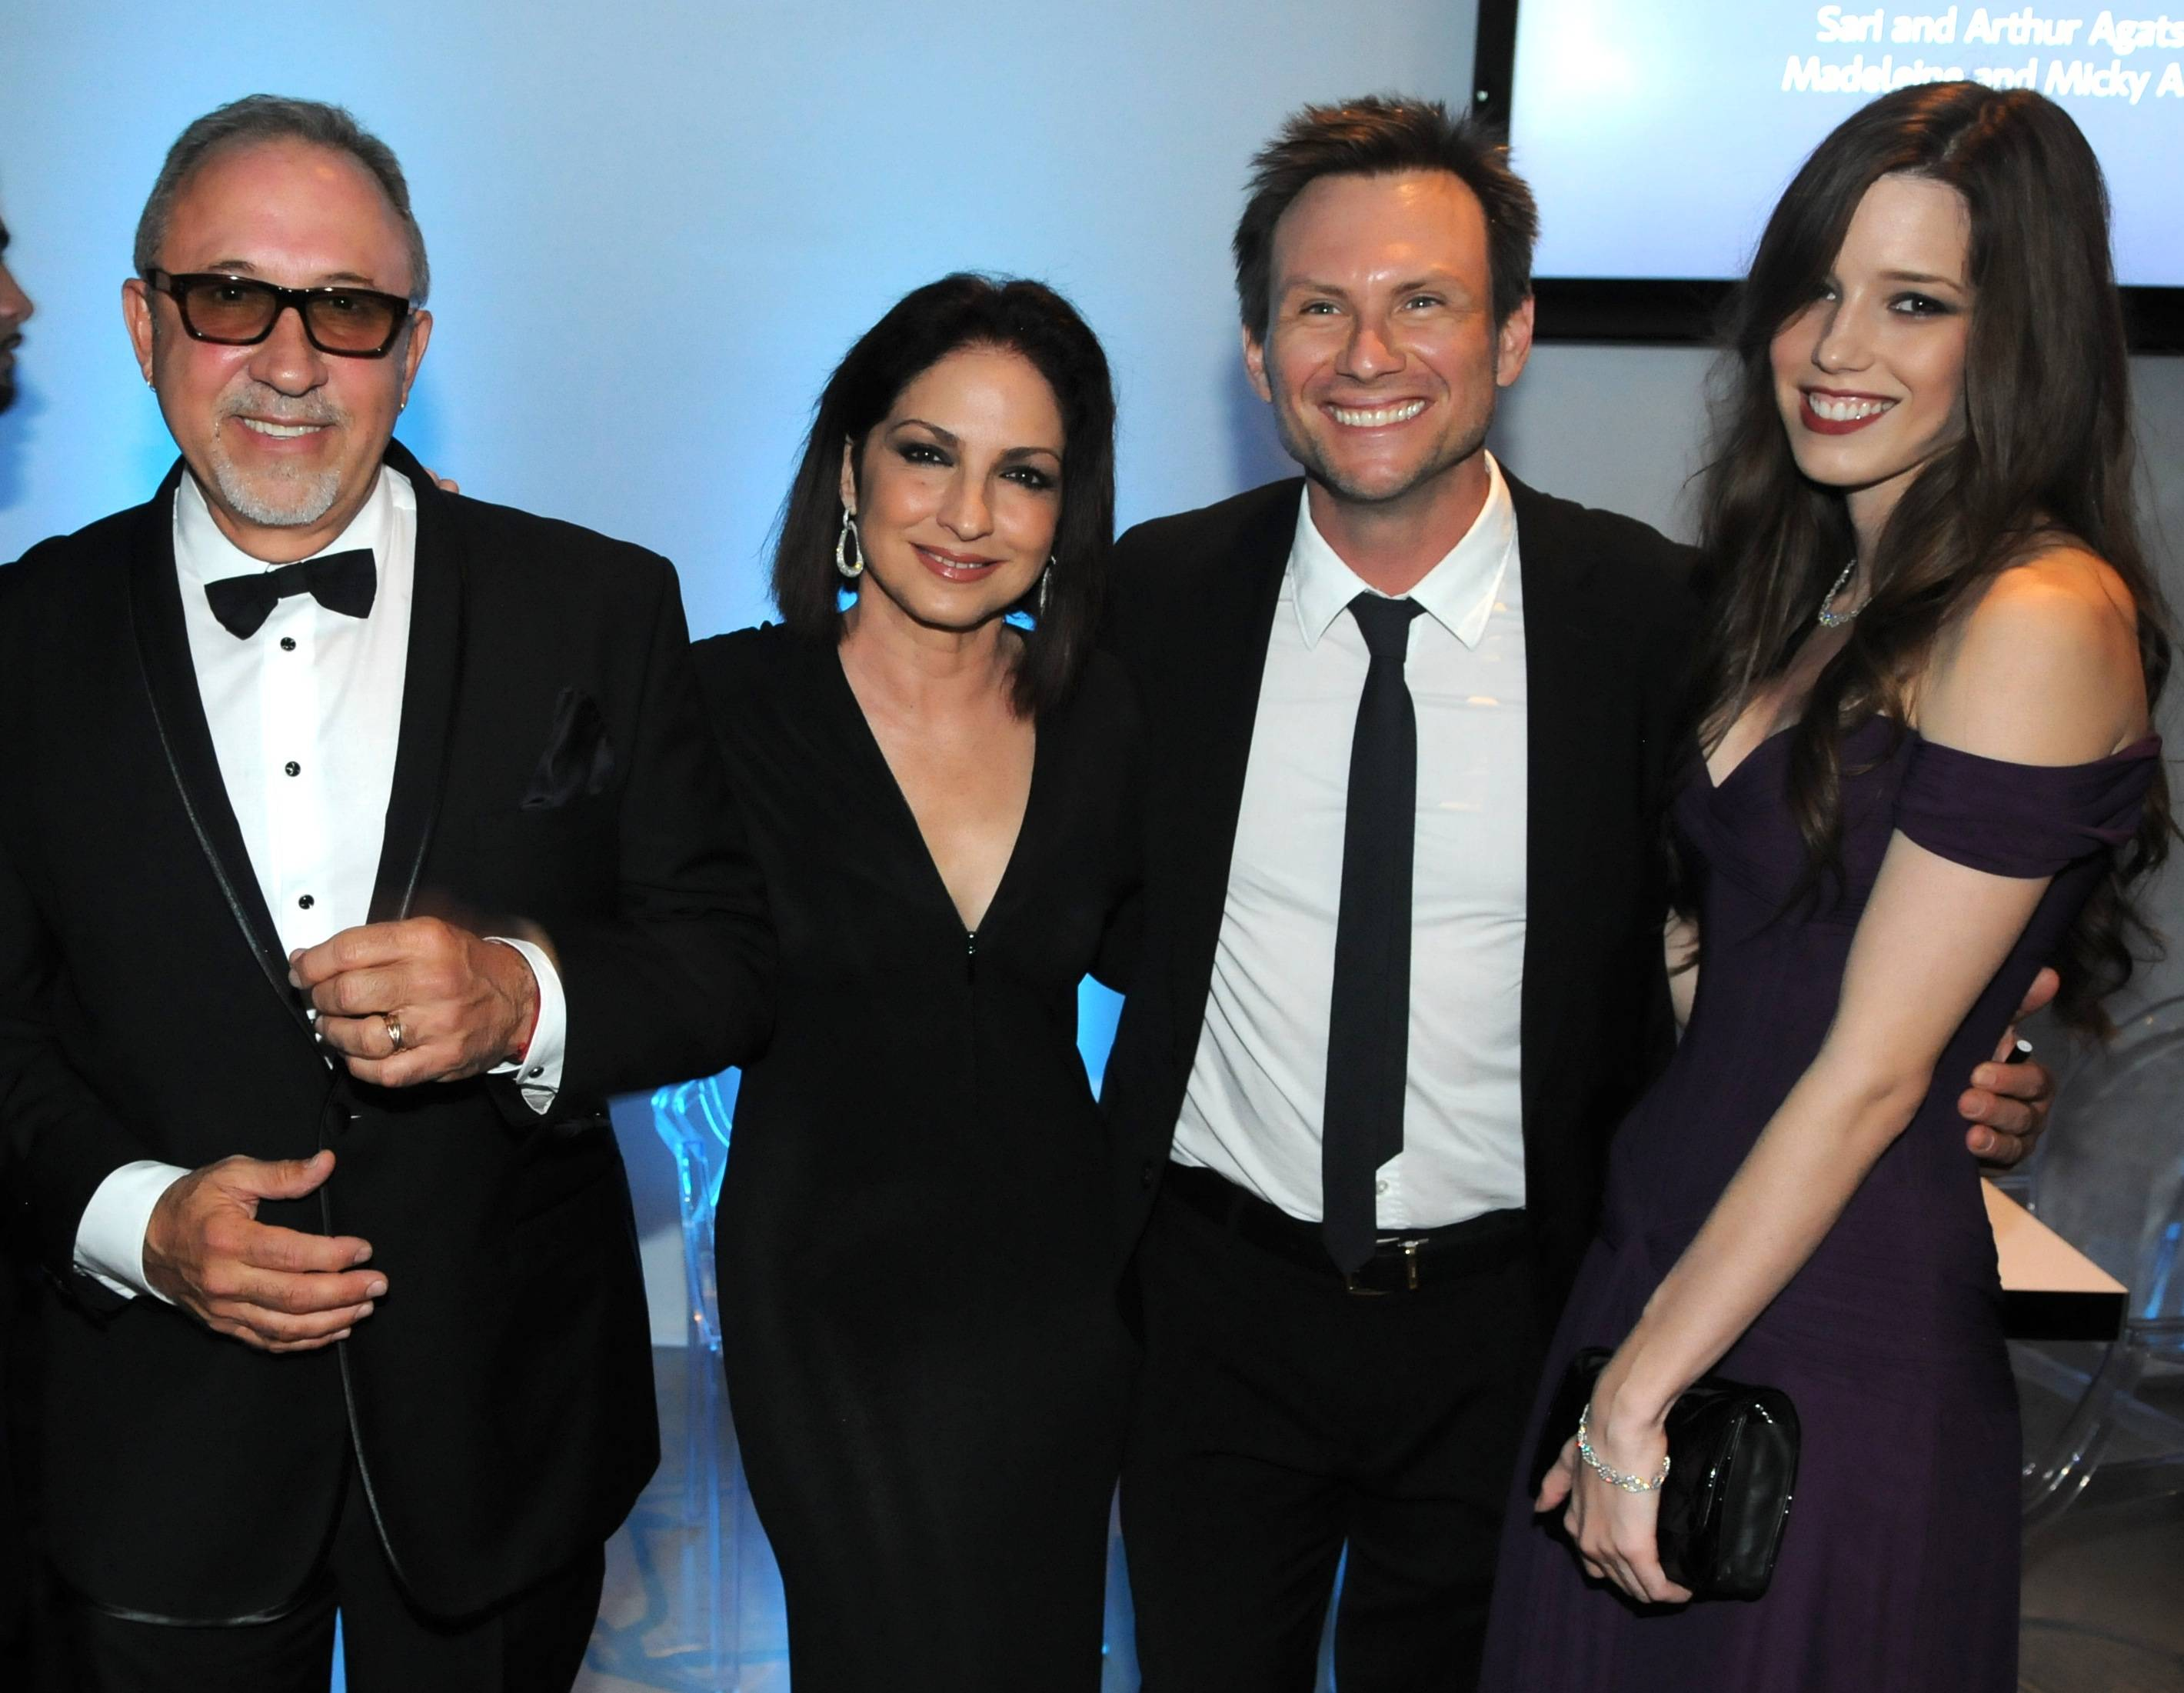 Emilio Estefan, Gloria Estefan, Christian Slater, Brittany Lopez